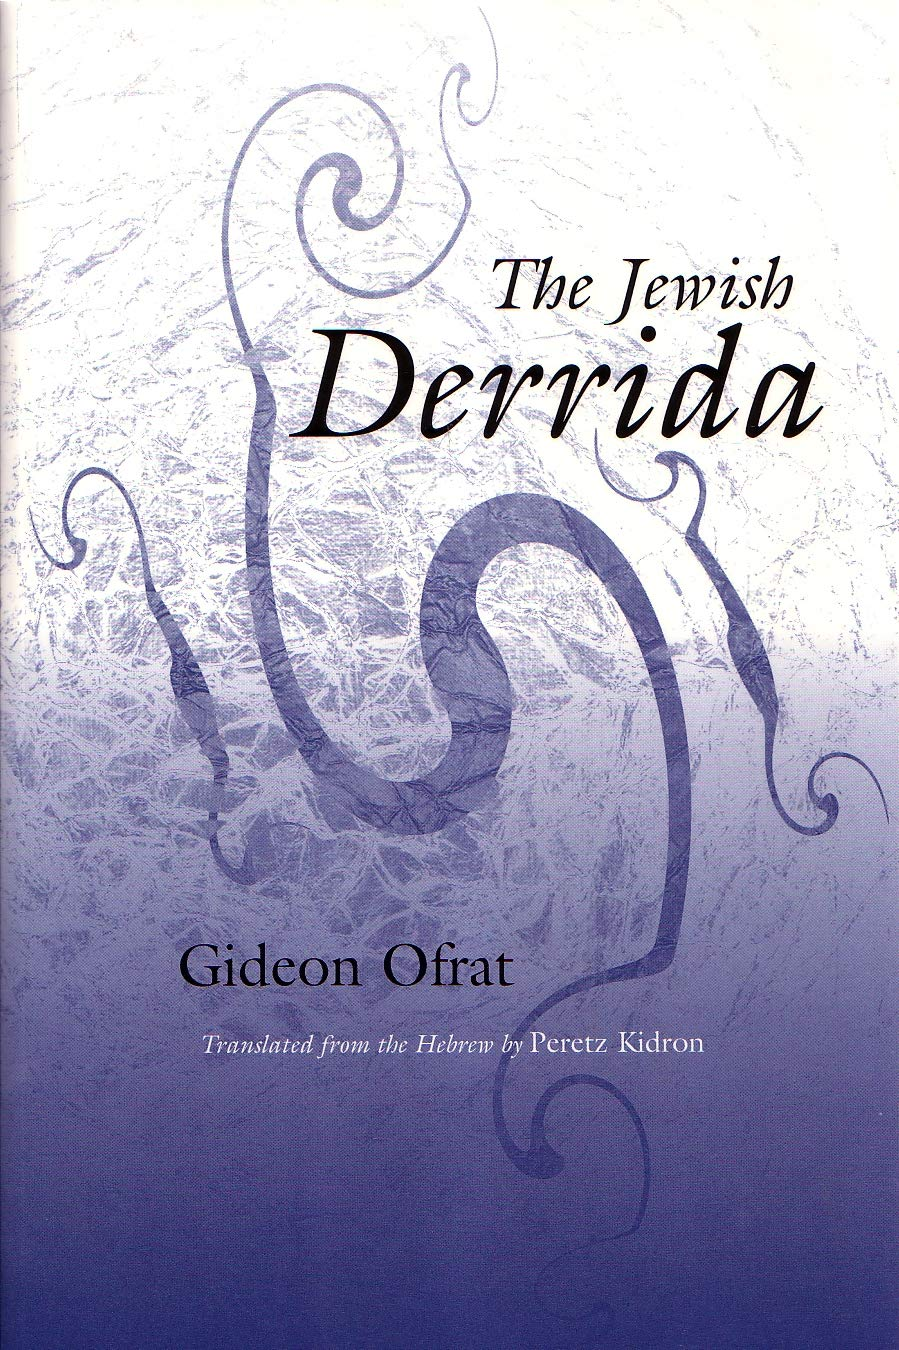 The Jewish Derrida (Library of Jewish Philosophy): Ofrat, Gideon, Kidron, The  jewish Derrida Peretz: 9780815628859: Amazon.com: Books